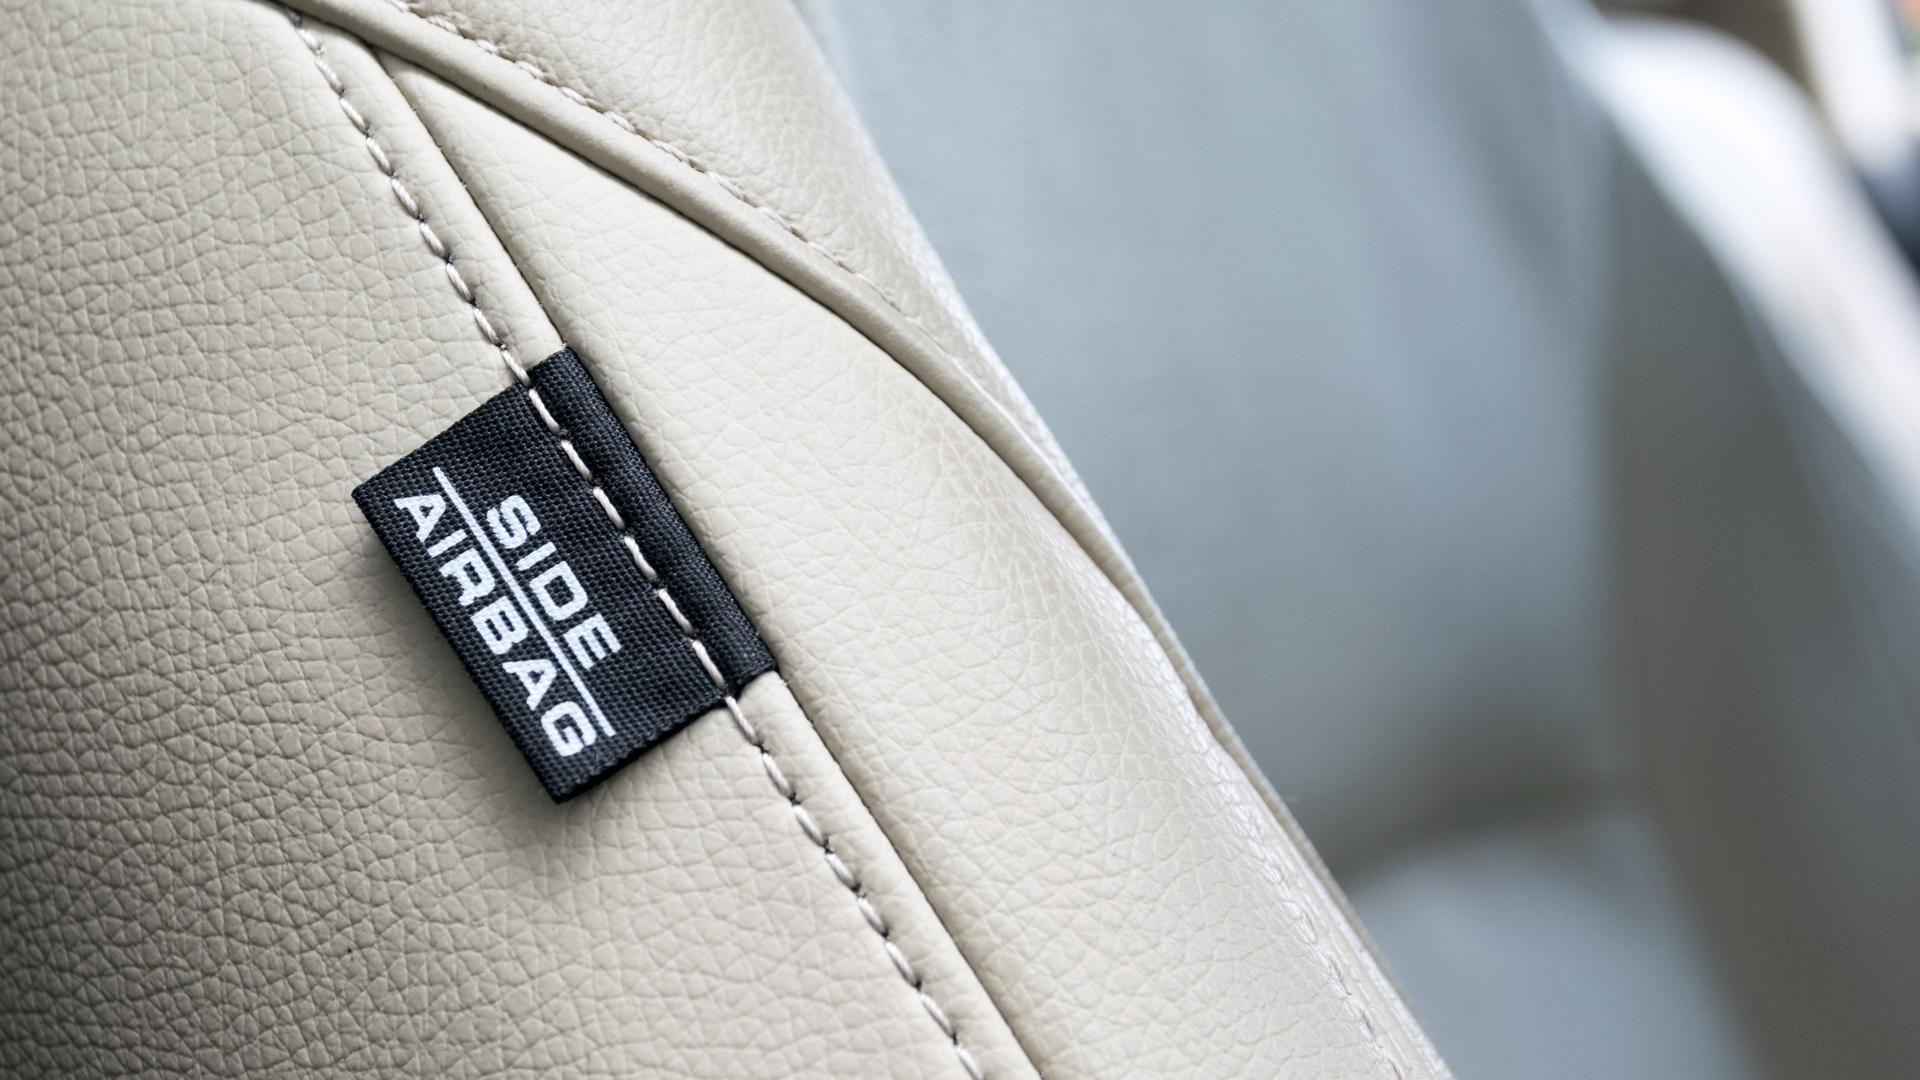 airbag lateral etiqueta detalhe banco de couro